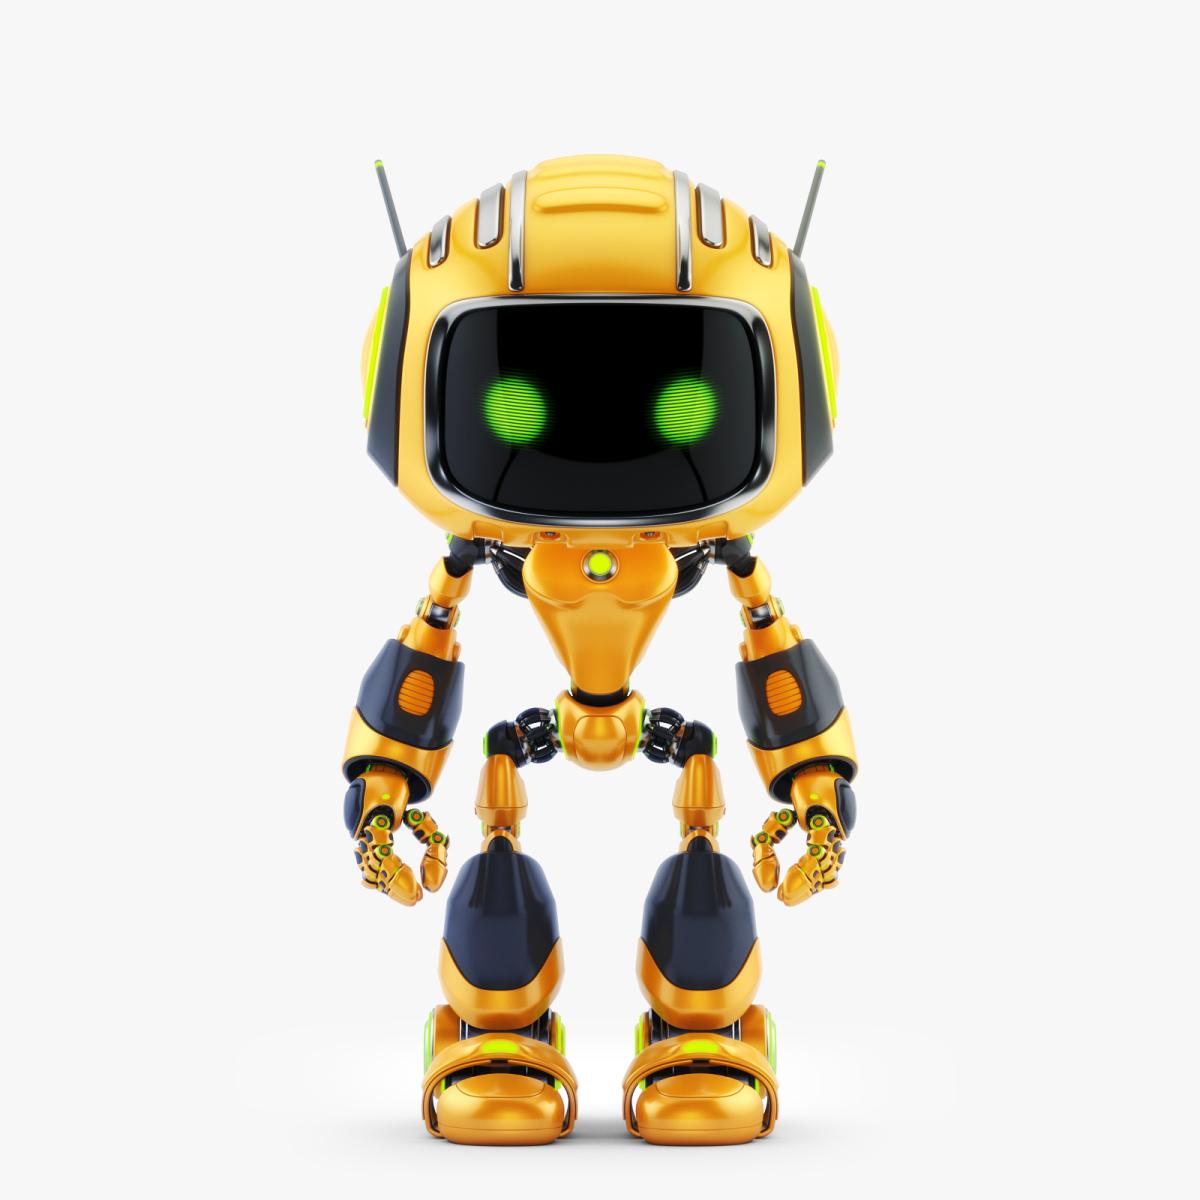 CUTE ALIEN ROBOT V 01